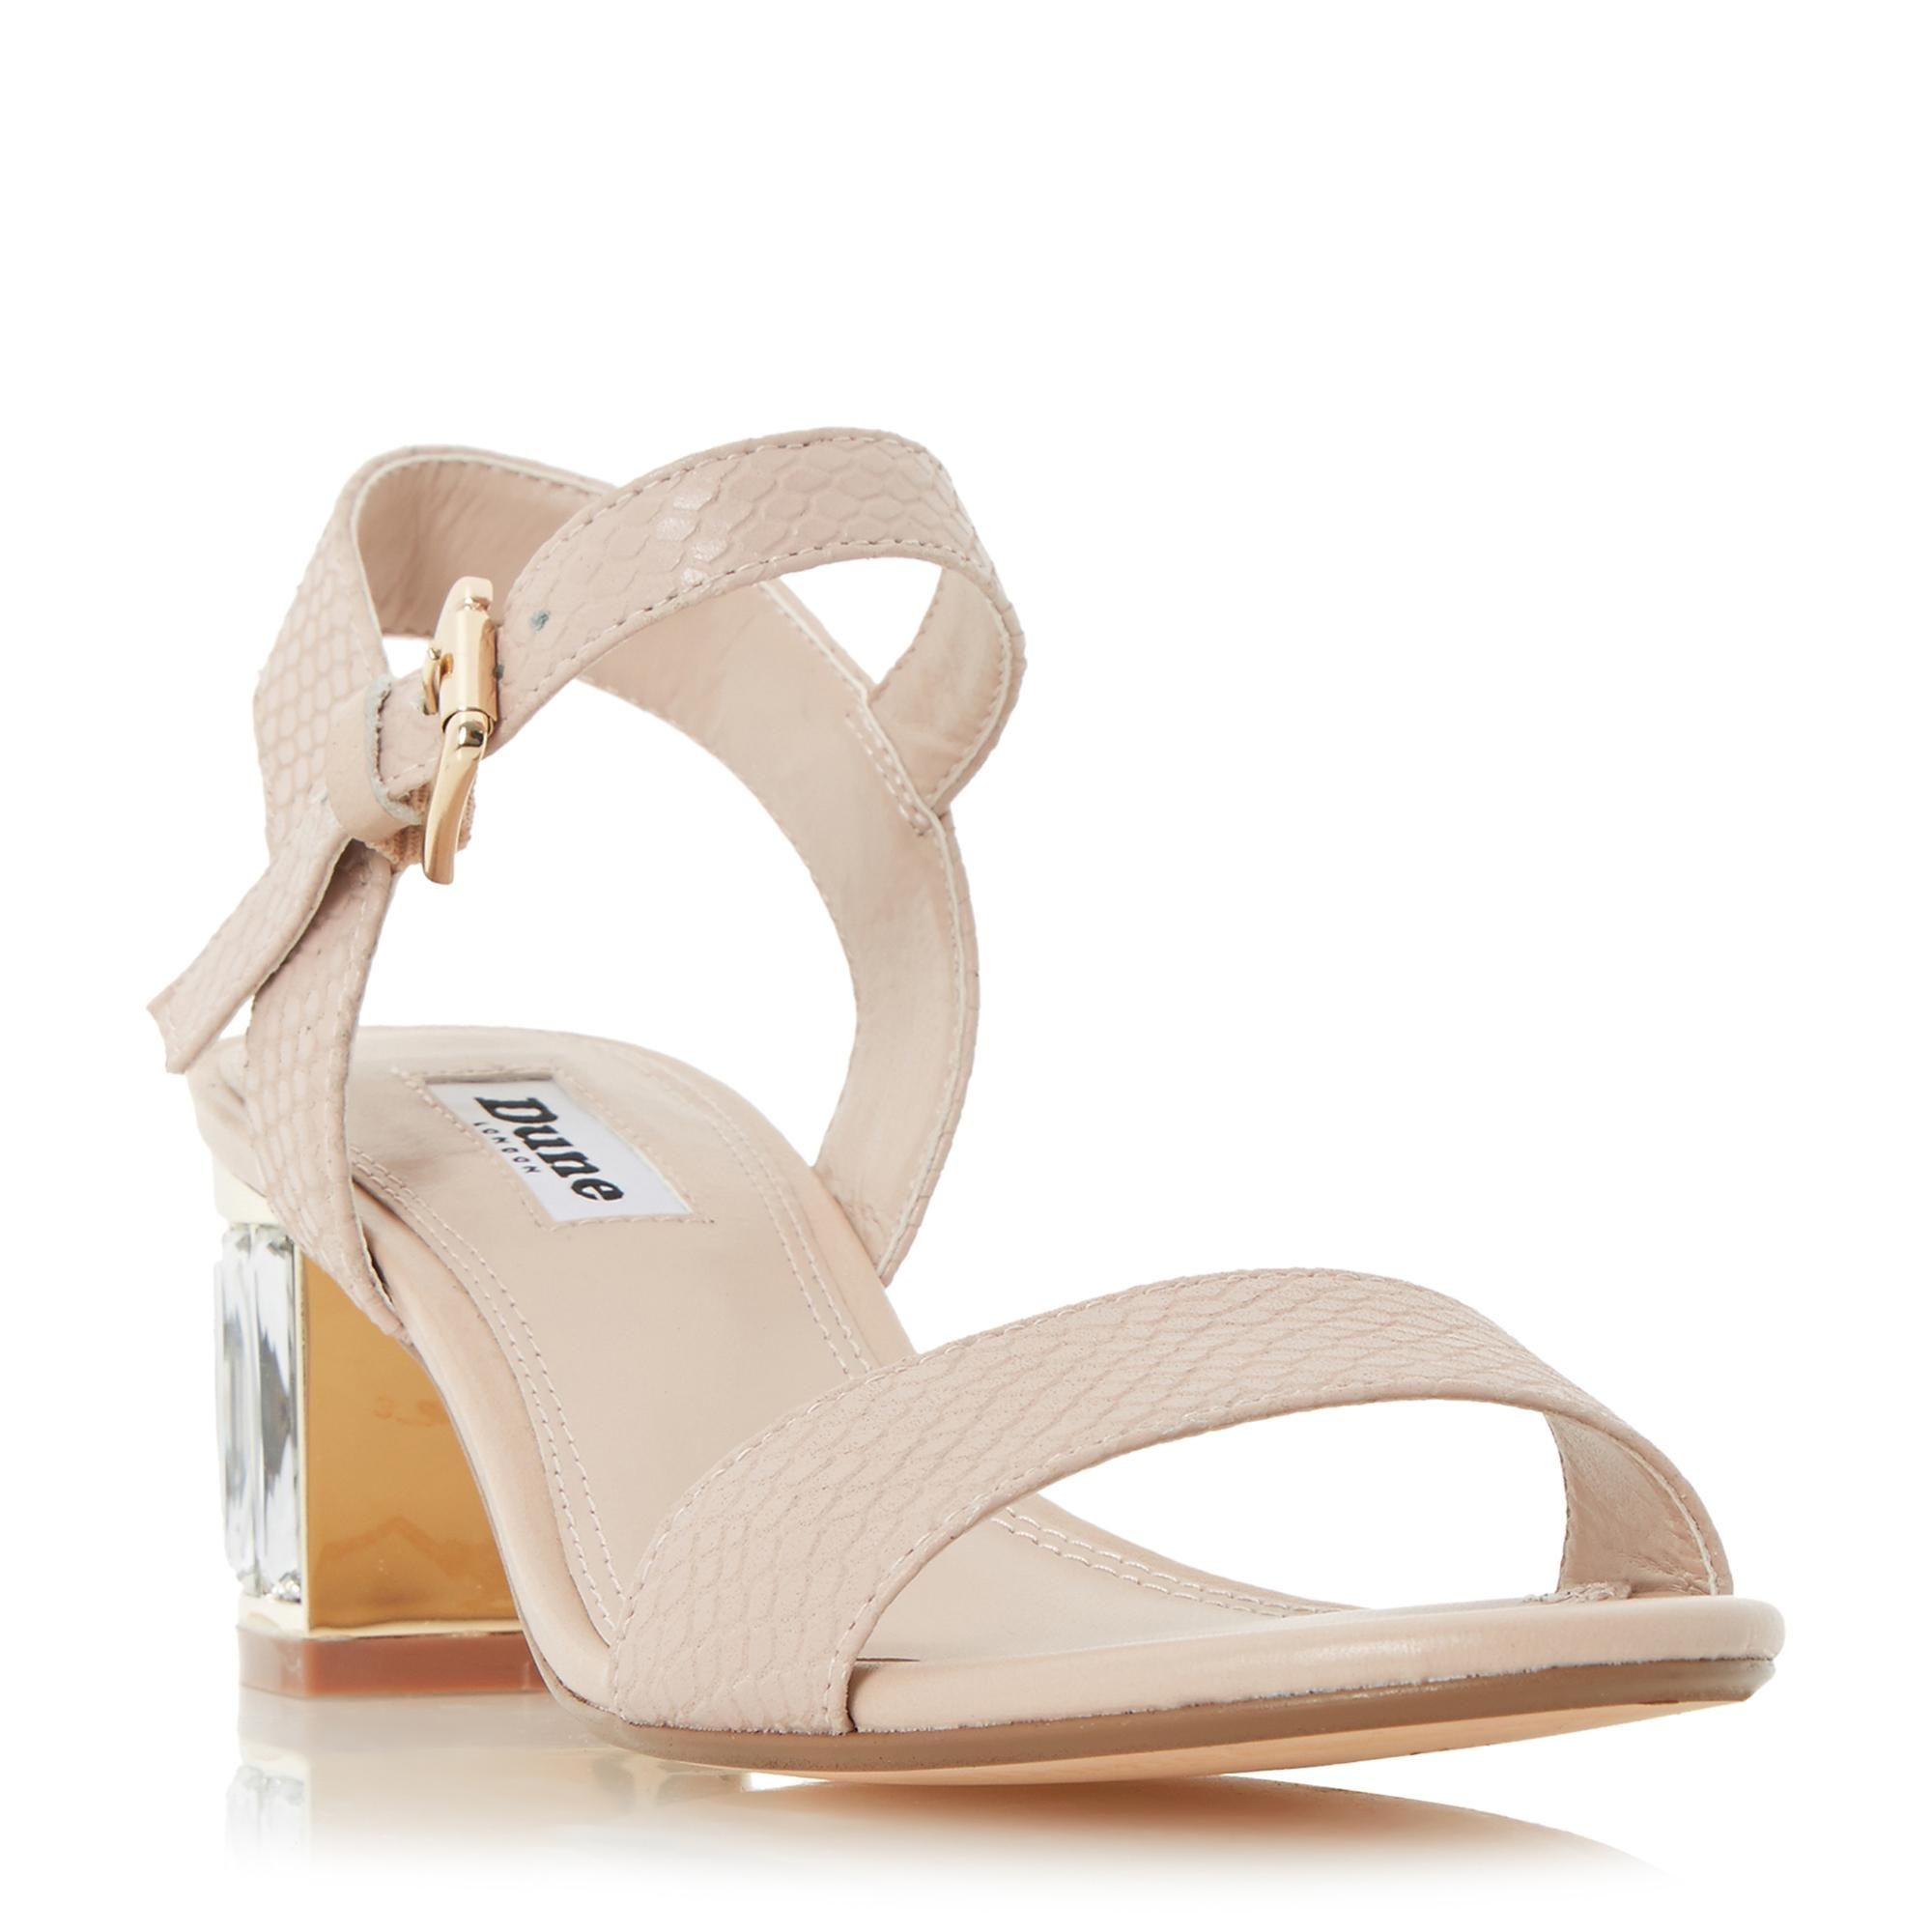 9f8e204ff52e6f DUNE LADIES MARCIA - Jewelled Block Heel Sandal - nude